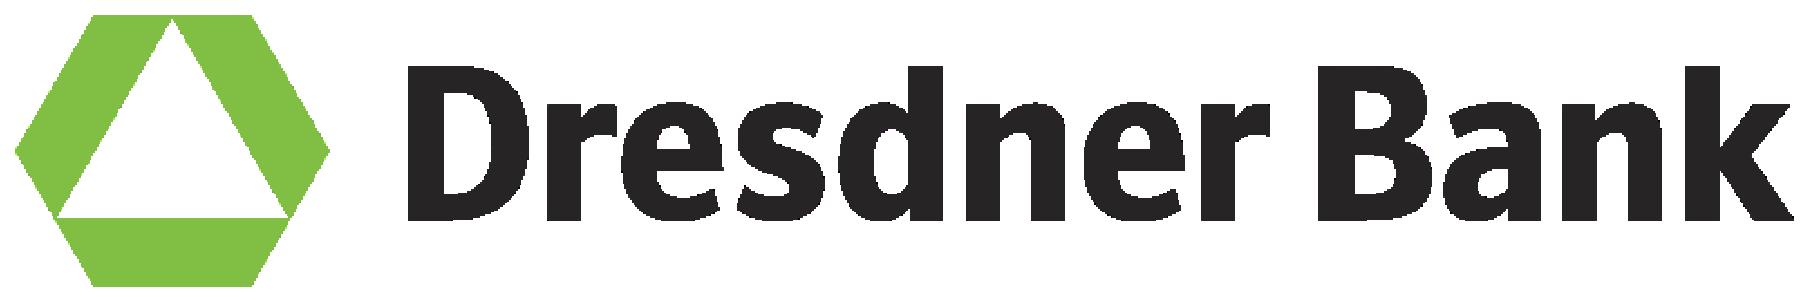 300px logo drens